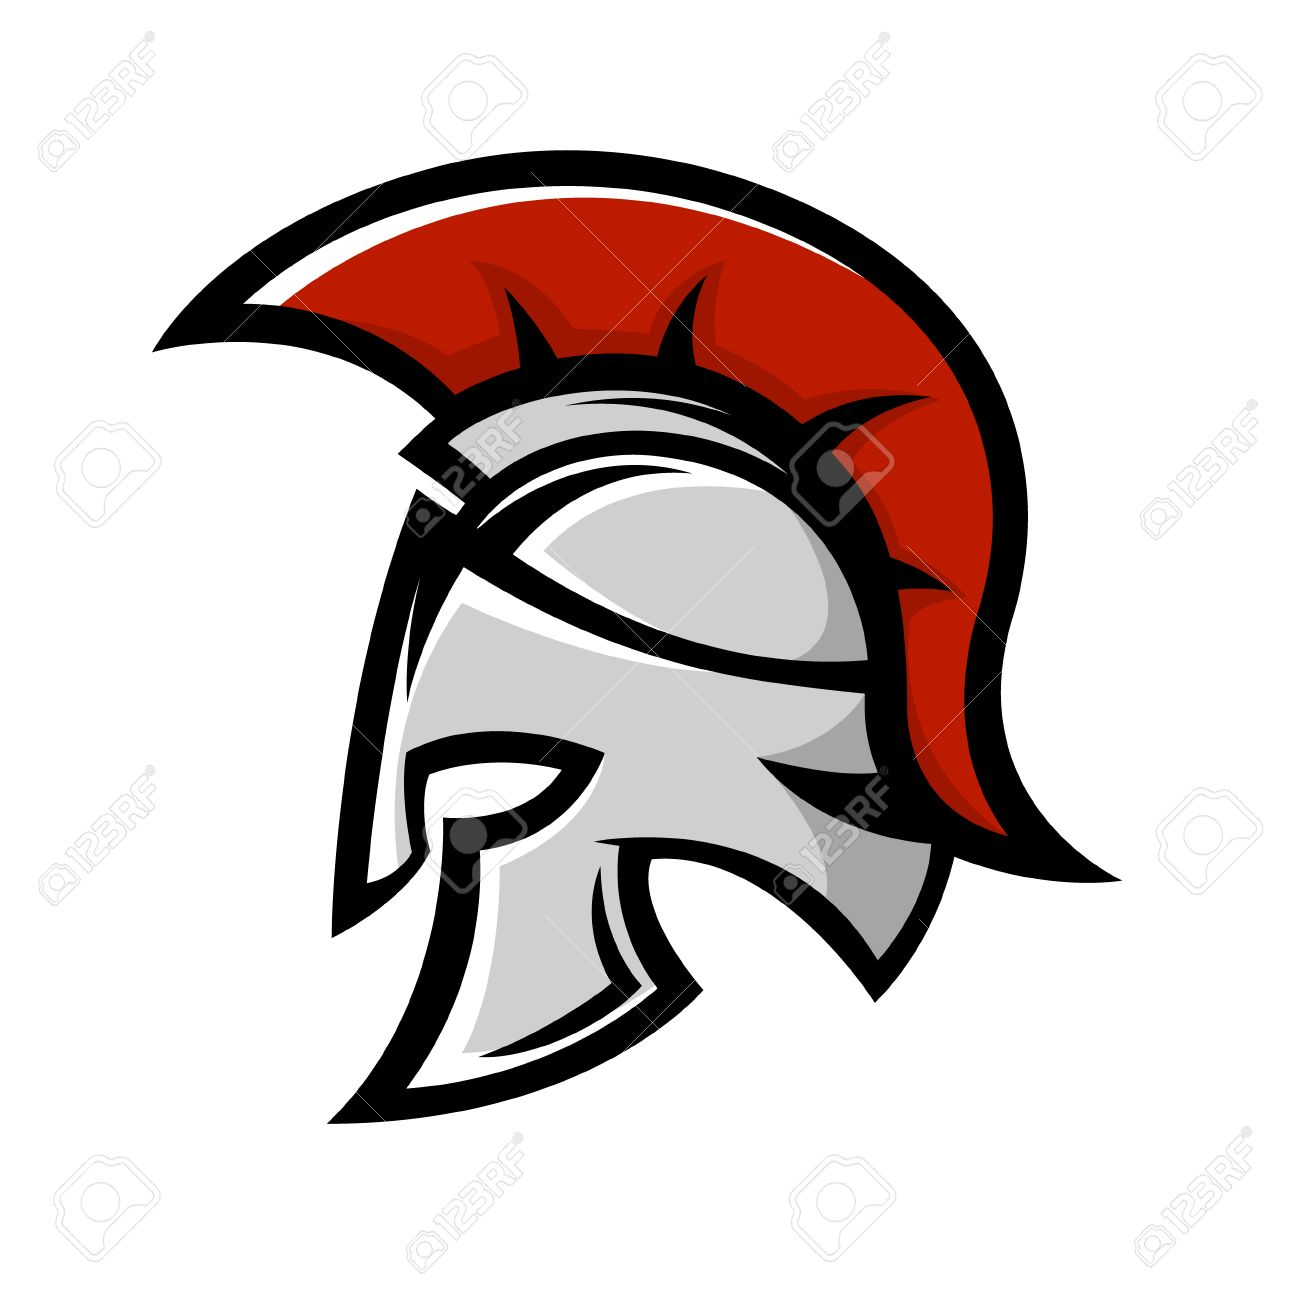 2ad8b3b01a8b7 Vector illustration. Spartan warrior helmet. Sports team emblem template.  Design element for logo, label,